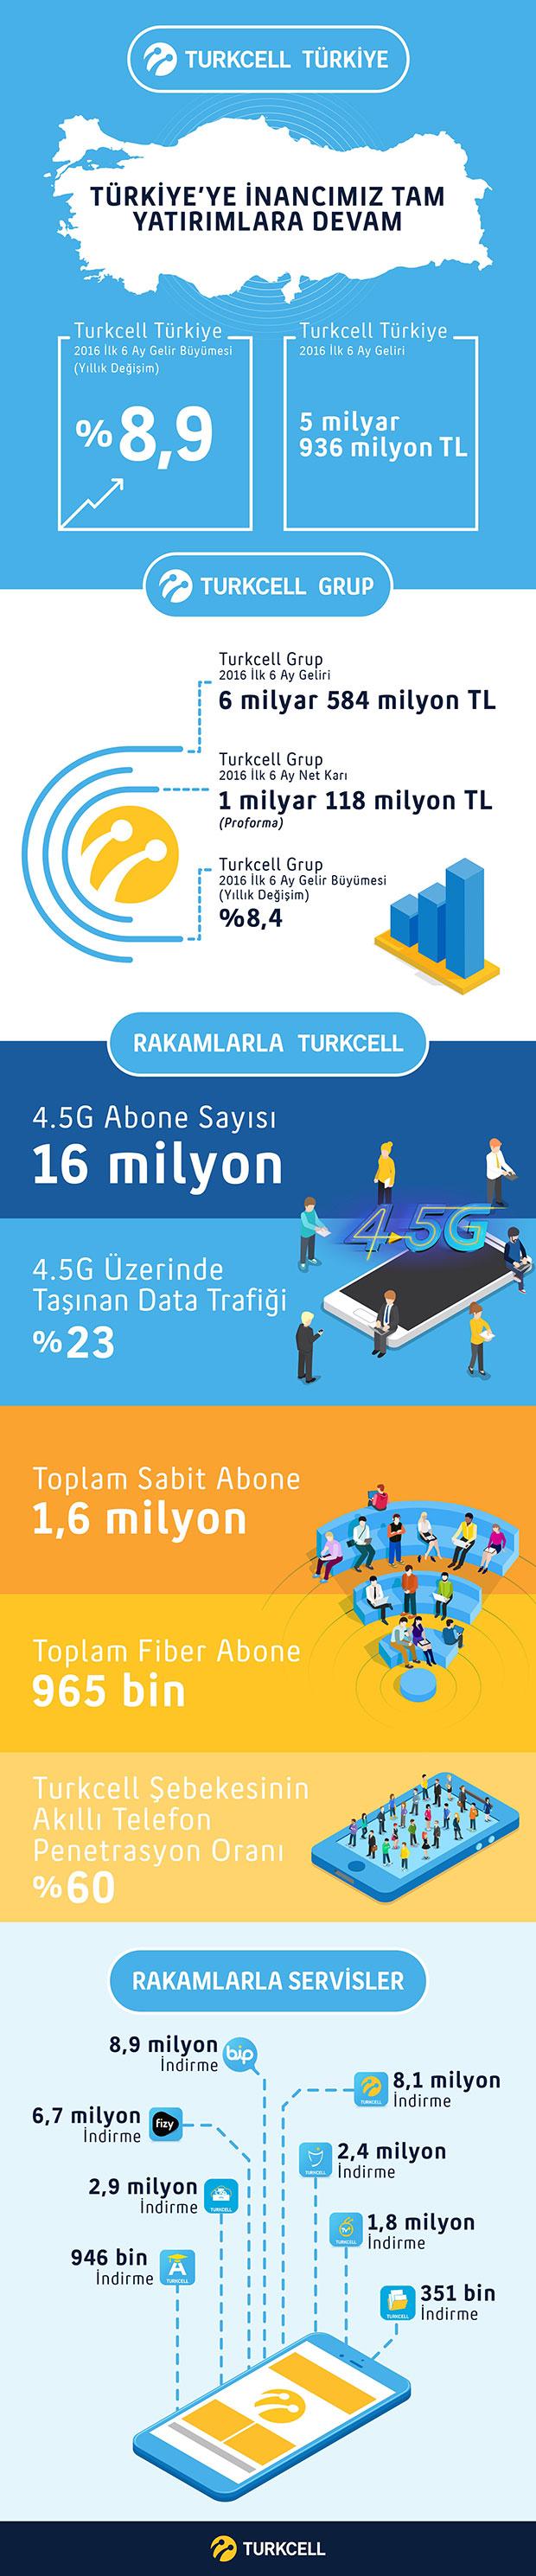 turkcell-2016